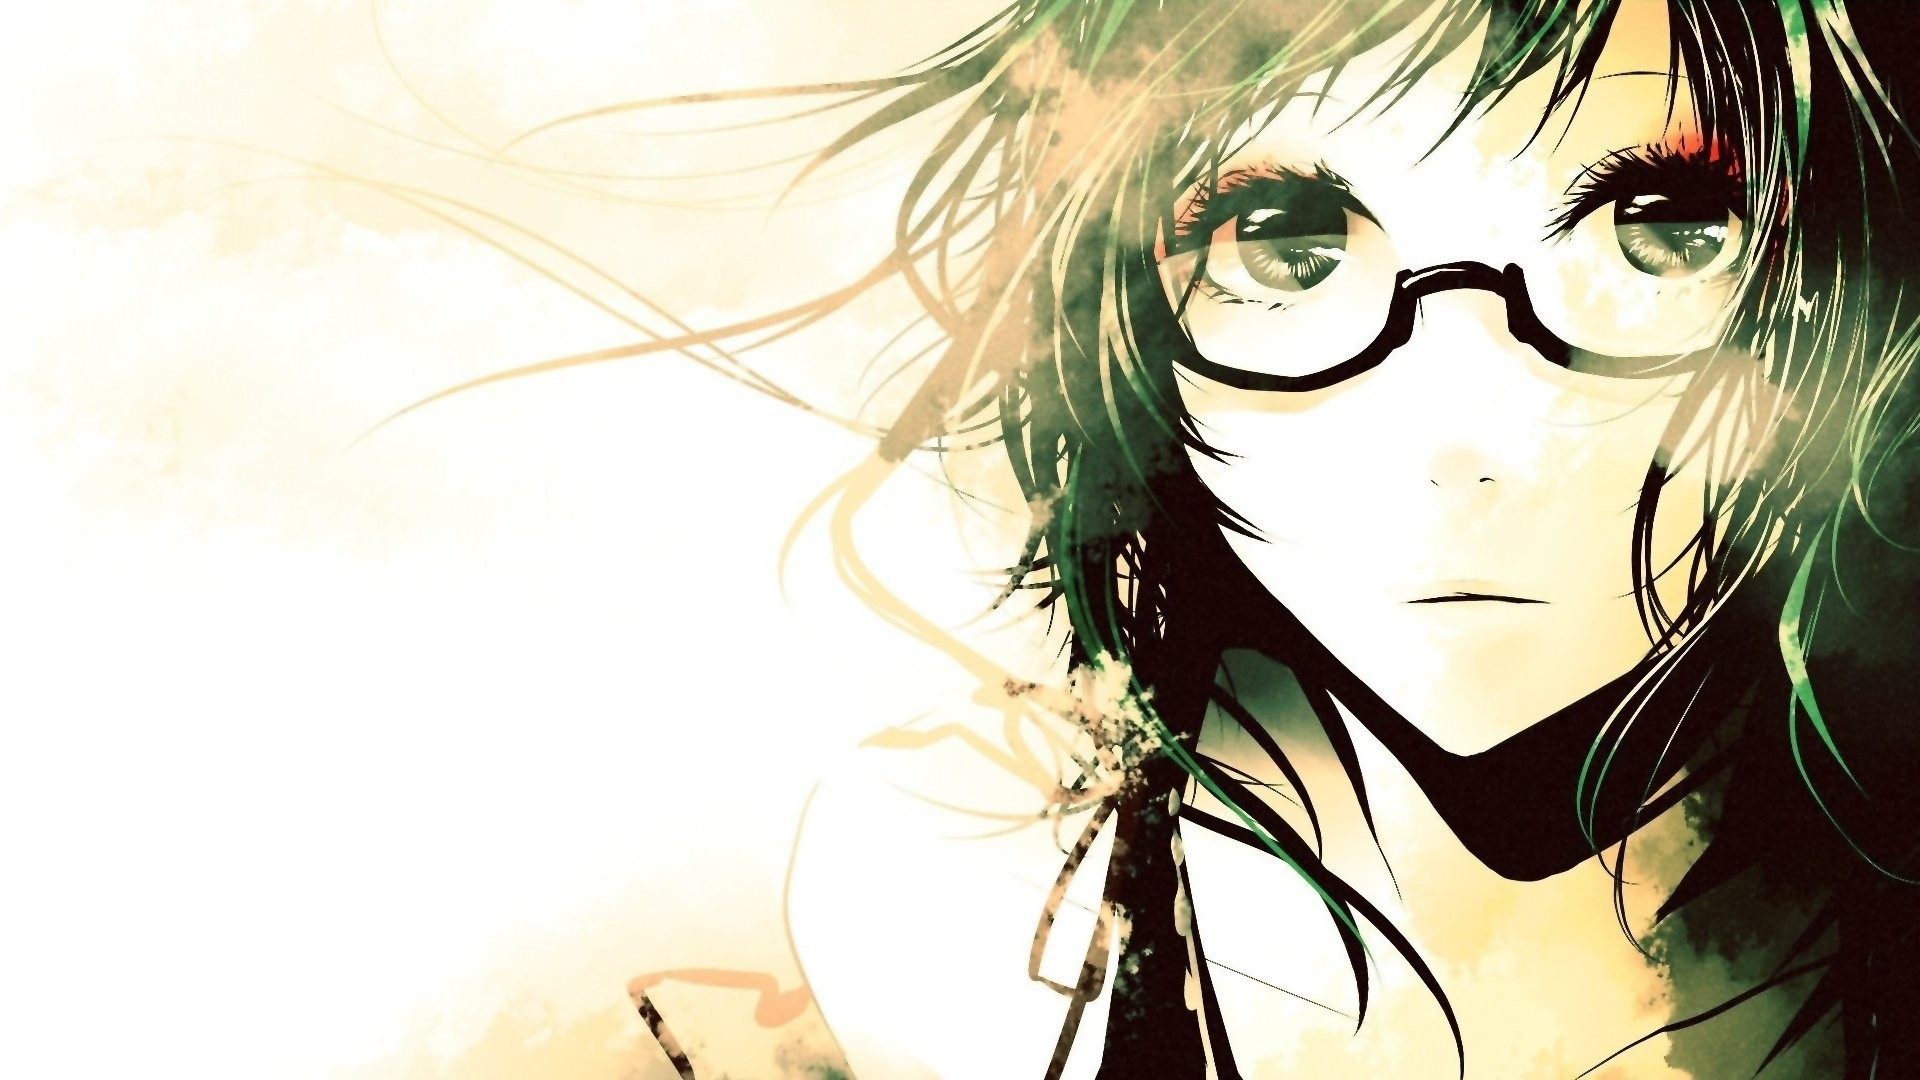 1366x768 anime wallpaper 58 images - Wallpaper hd 1920x1080 anime ...